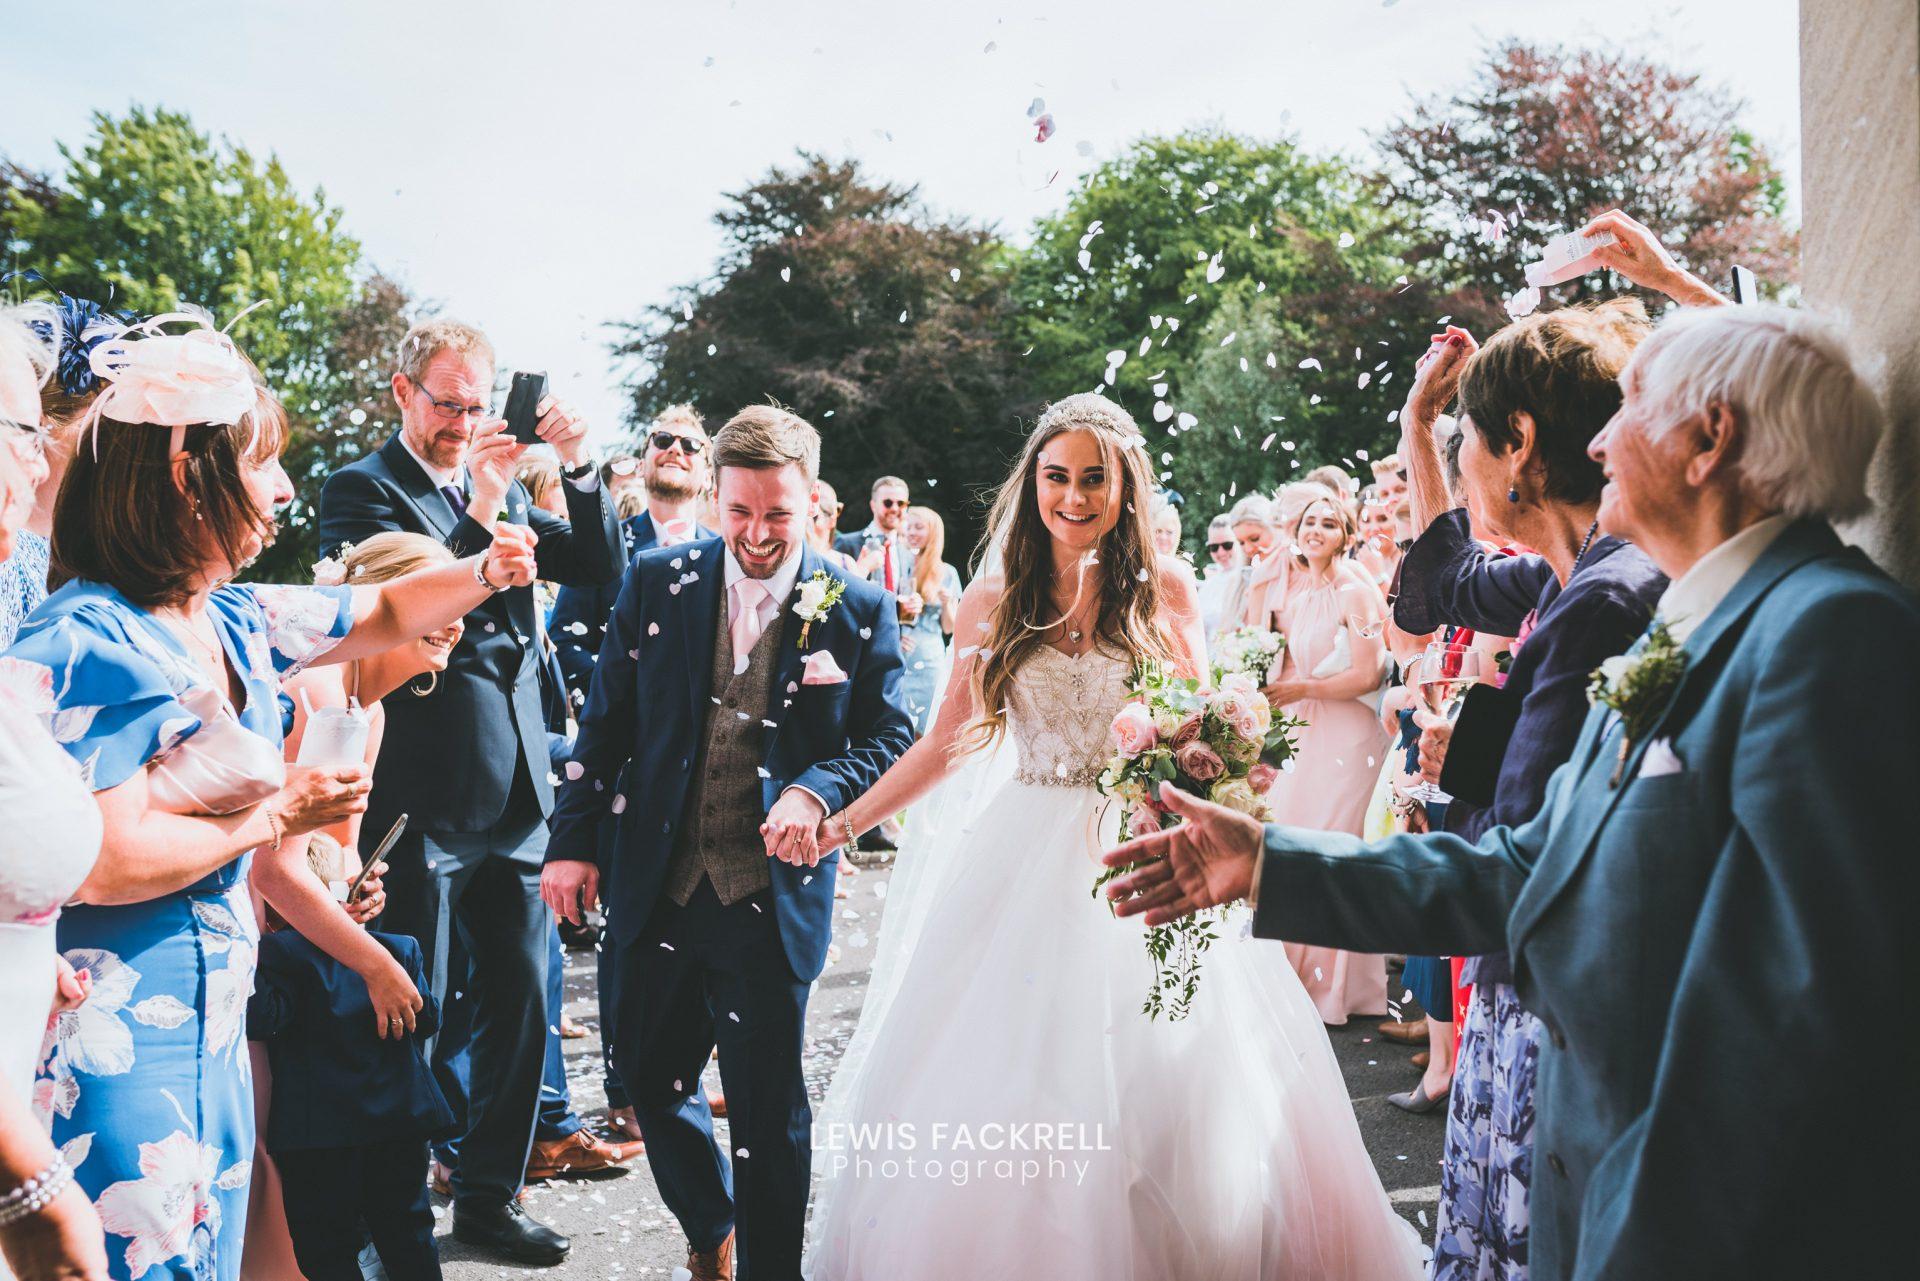 hensol castle wedding venue south wales of couple walking through confetti